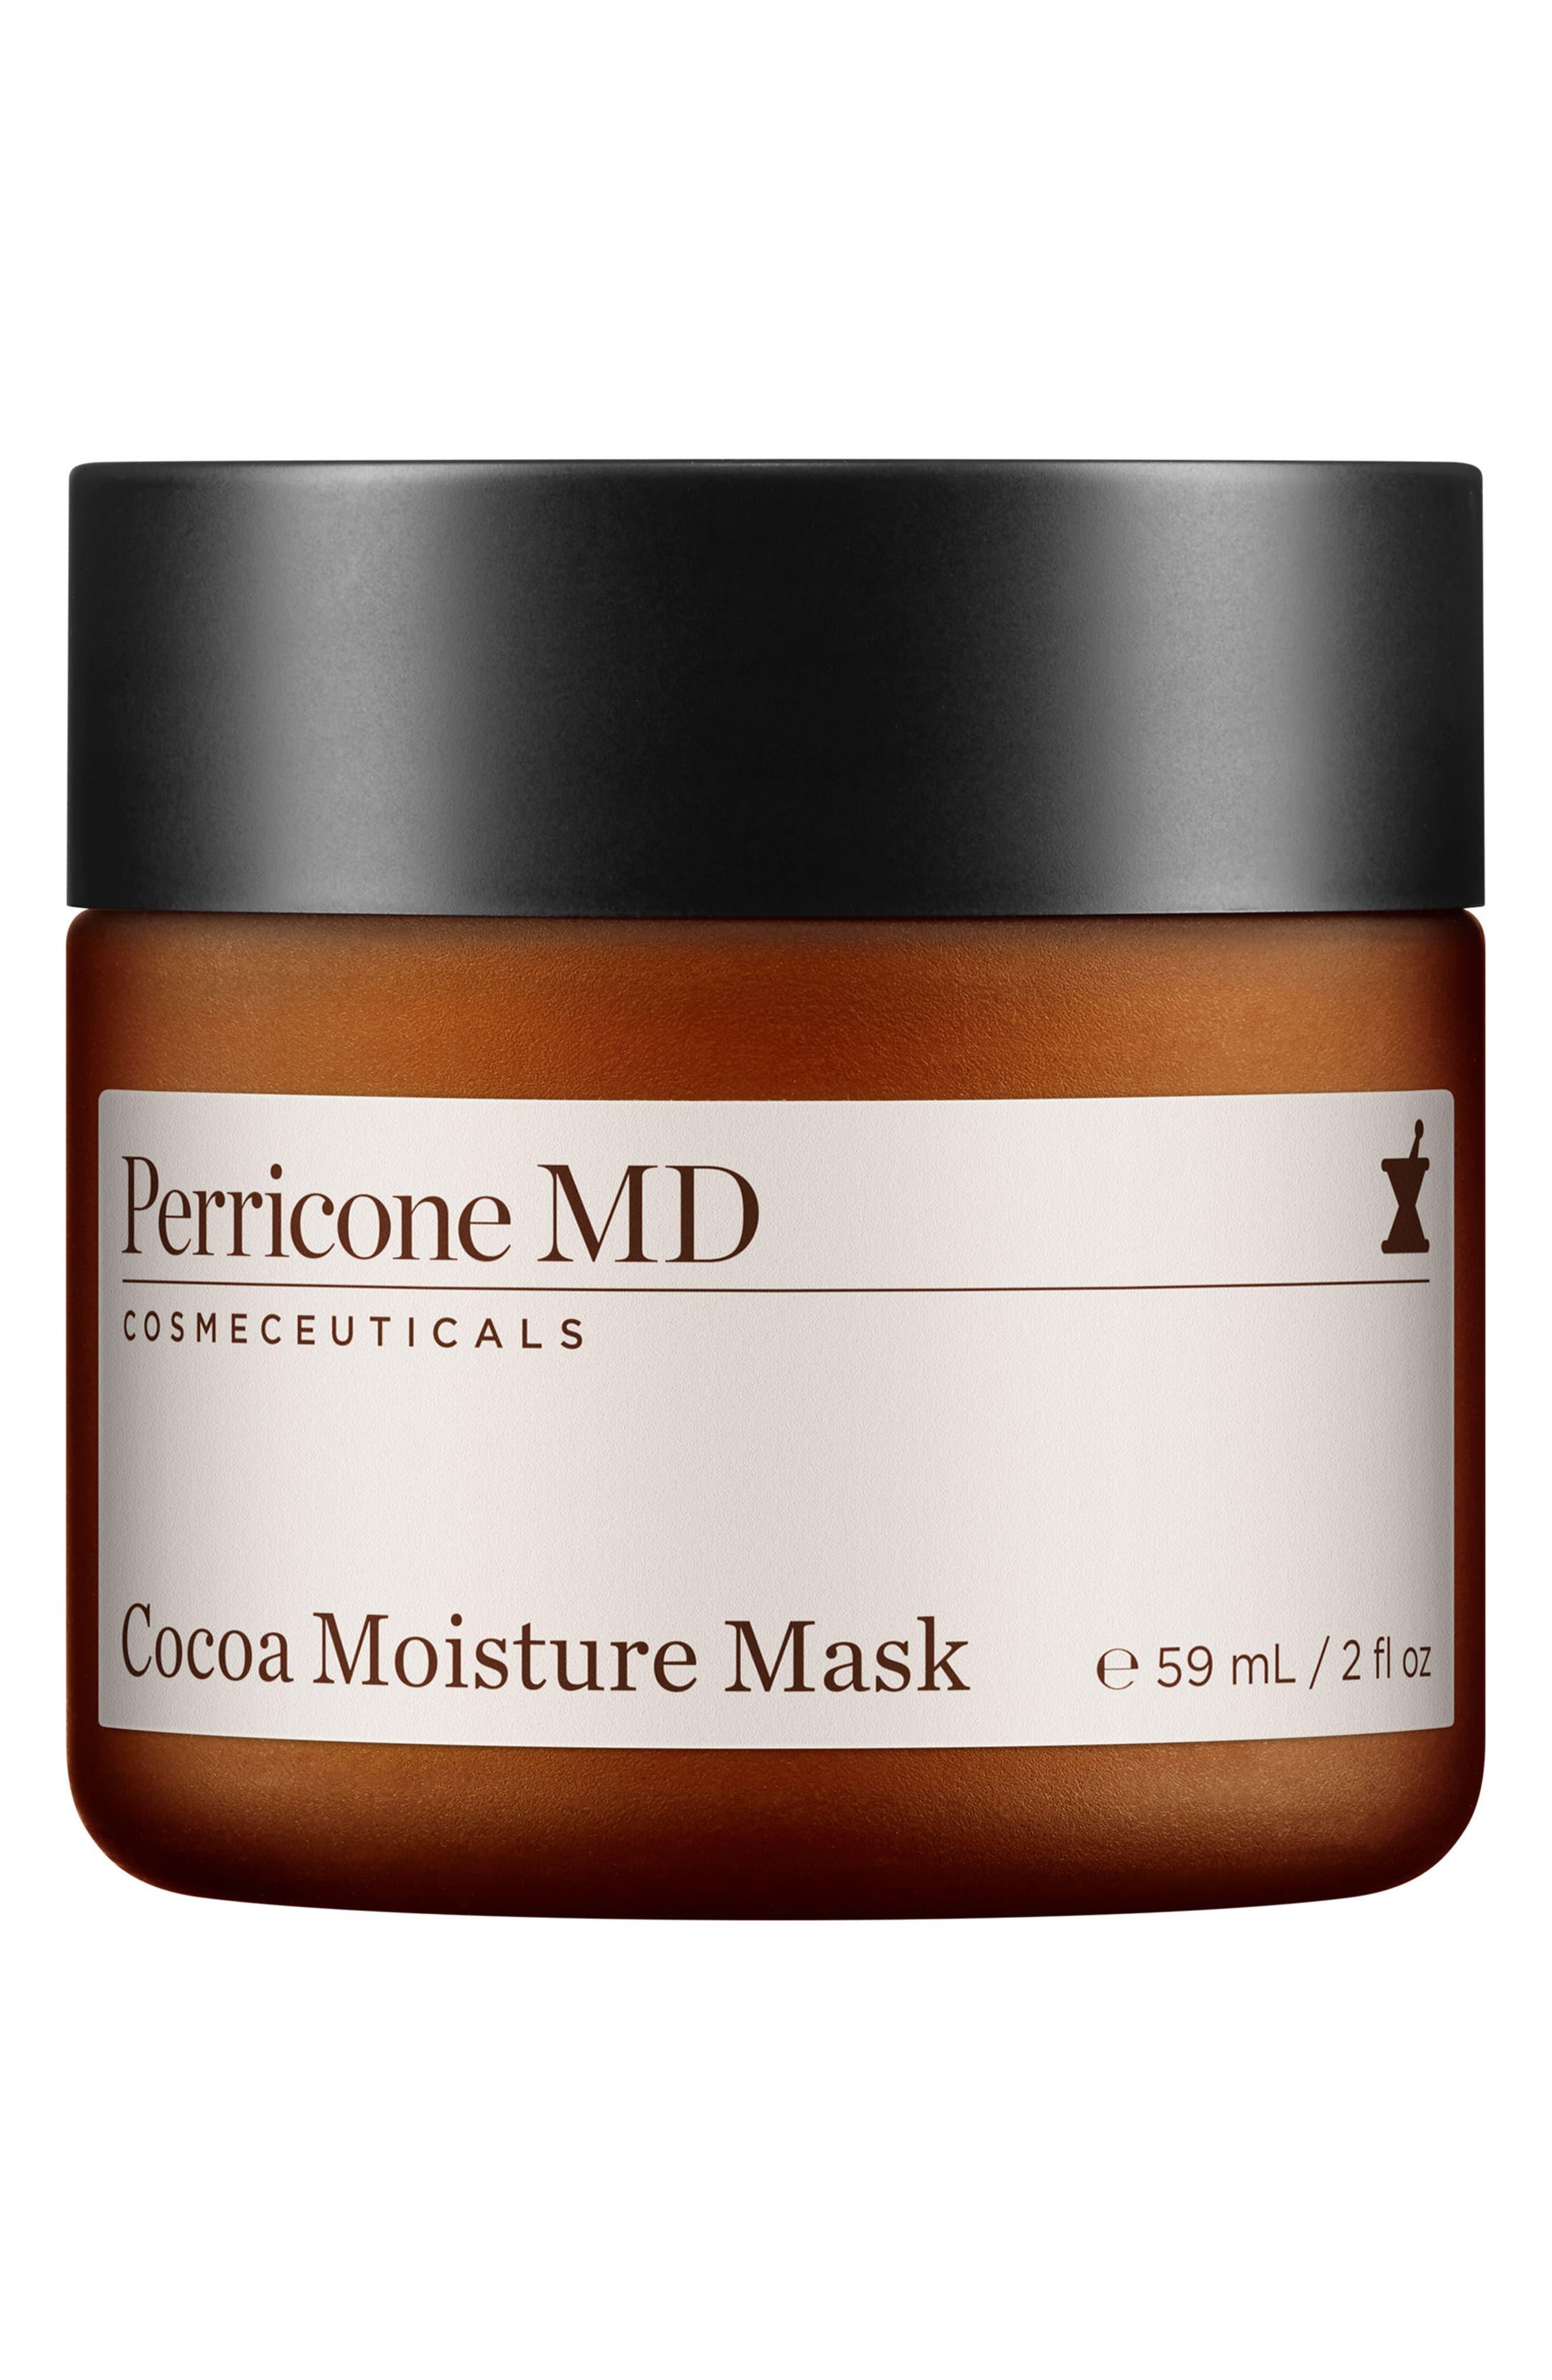 Perricone MD Cocoa Moisture Face Mask